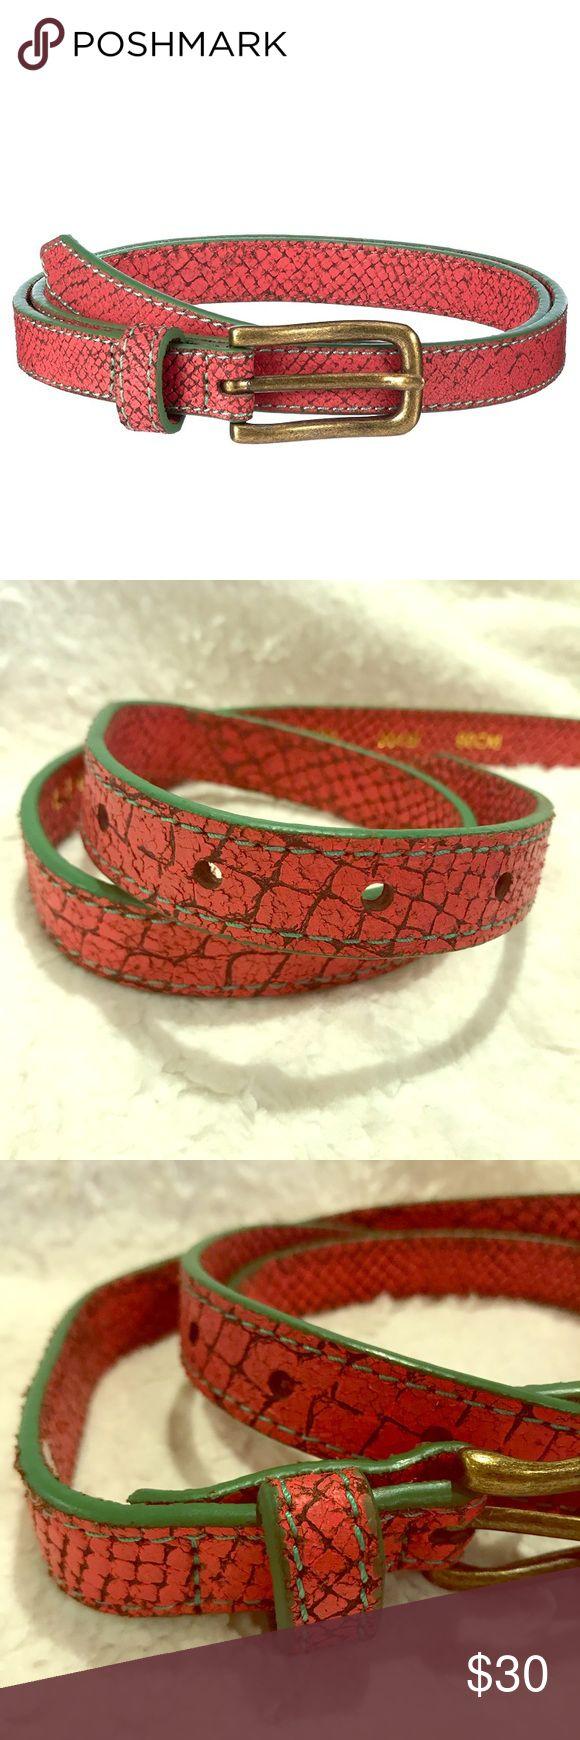 "100% Leather Pink & Green Women's Coral Snake Belt 100% Leather Pink & Green Women's Coral Snake Belt 2 cm (3/4"") wide 90 cm (35 1/2"") Long Liebeskind Accessories Belts"